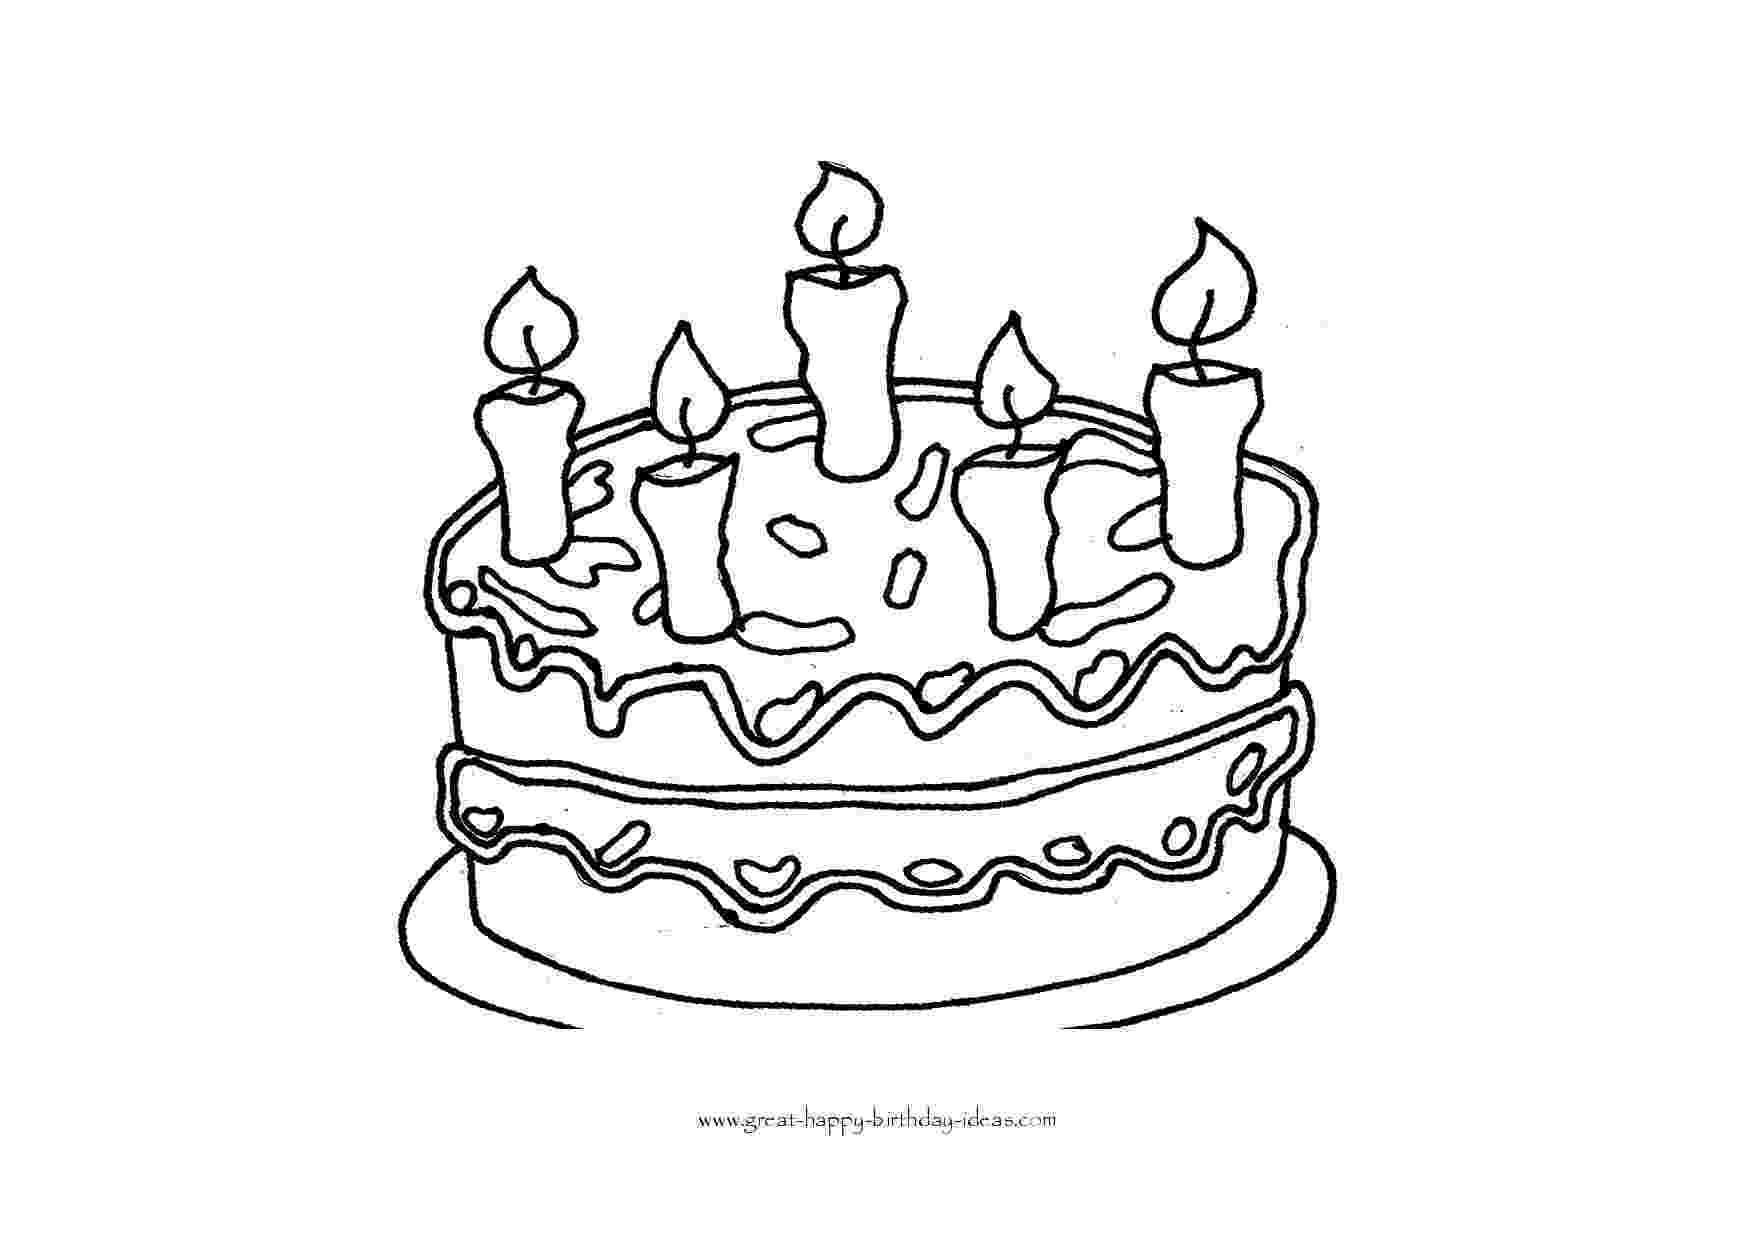 big birthday cake 50th birthday cake for mickey mouse london delivery big birthday cake